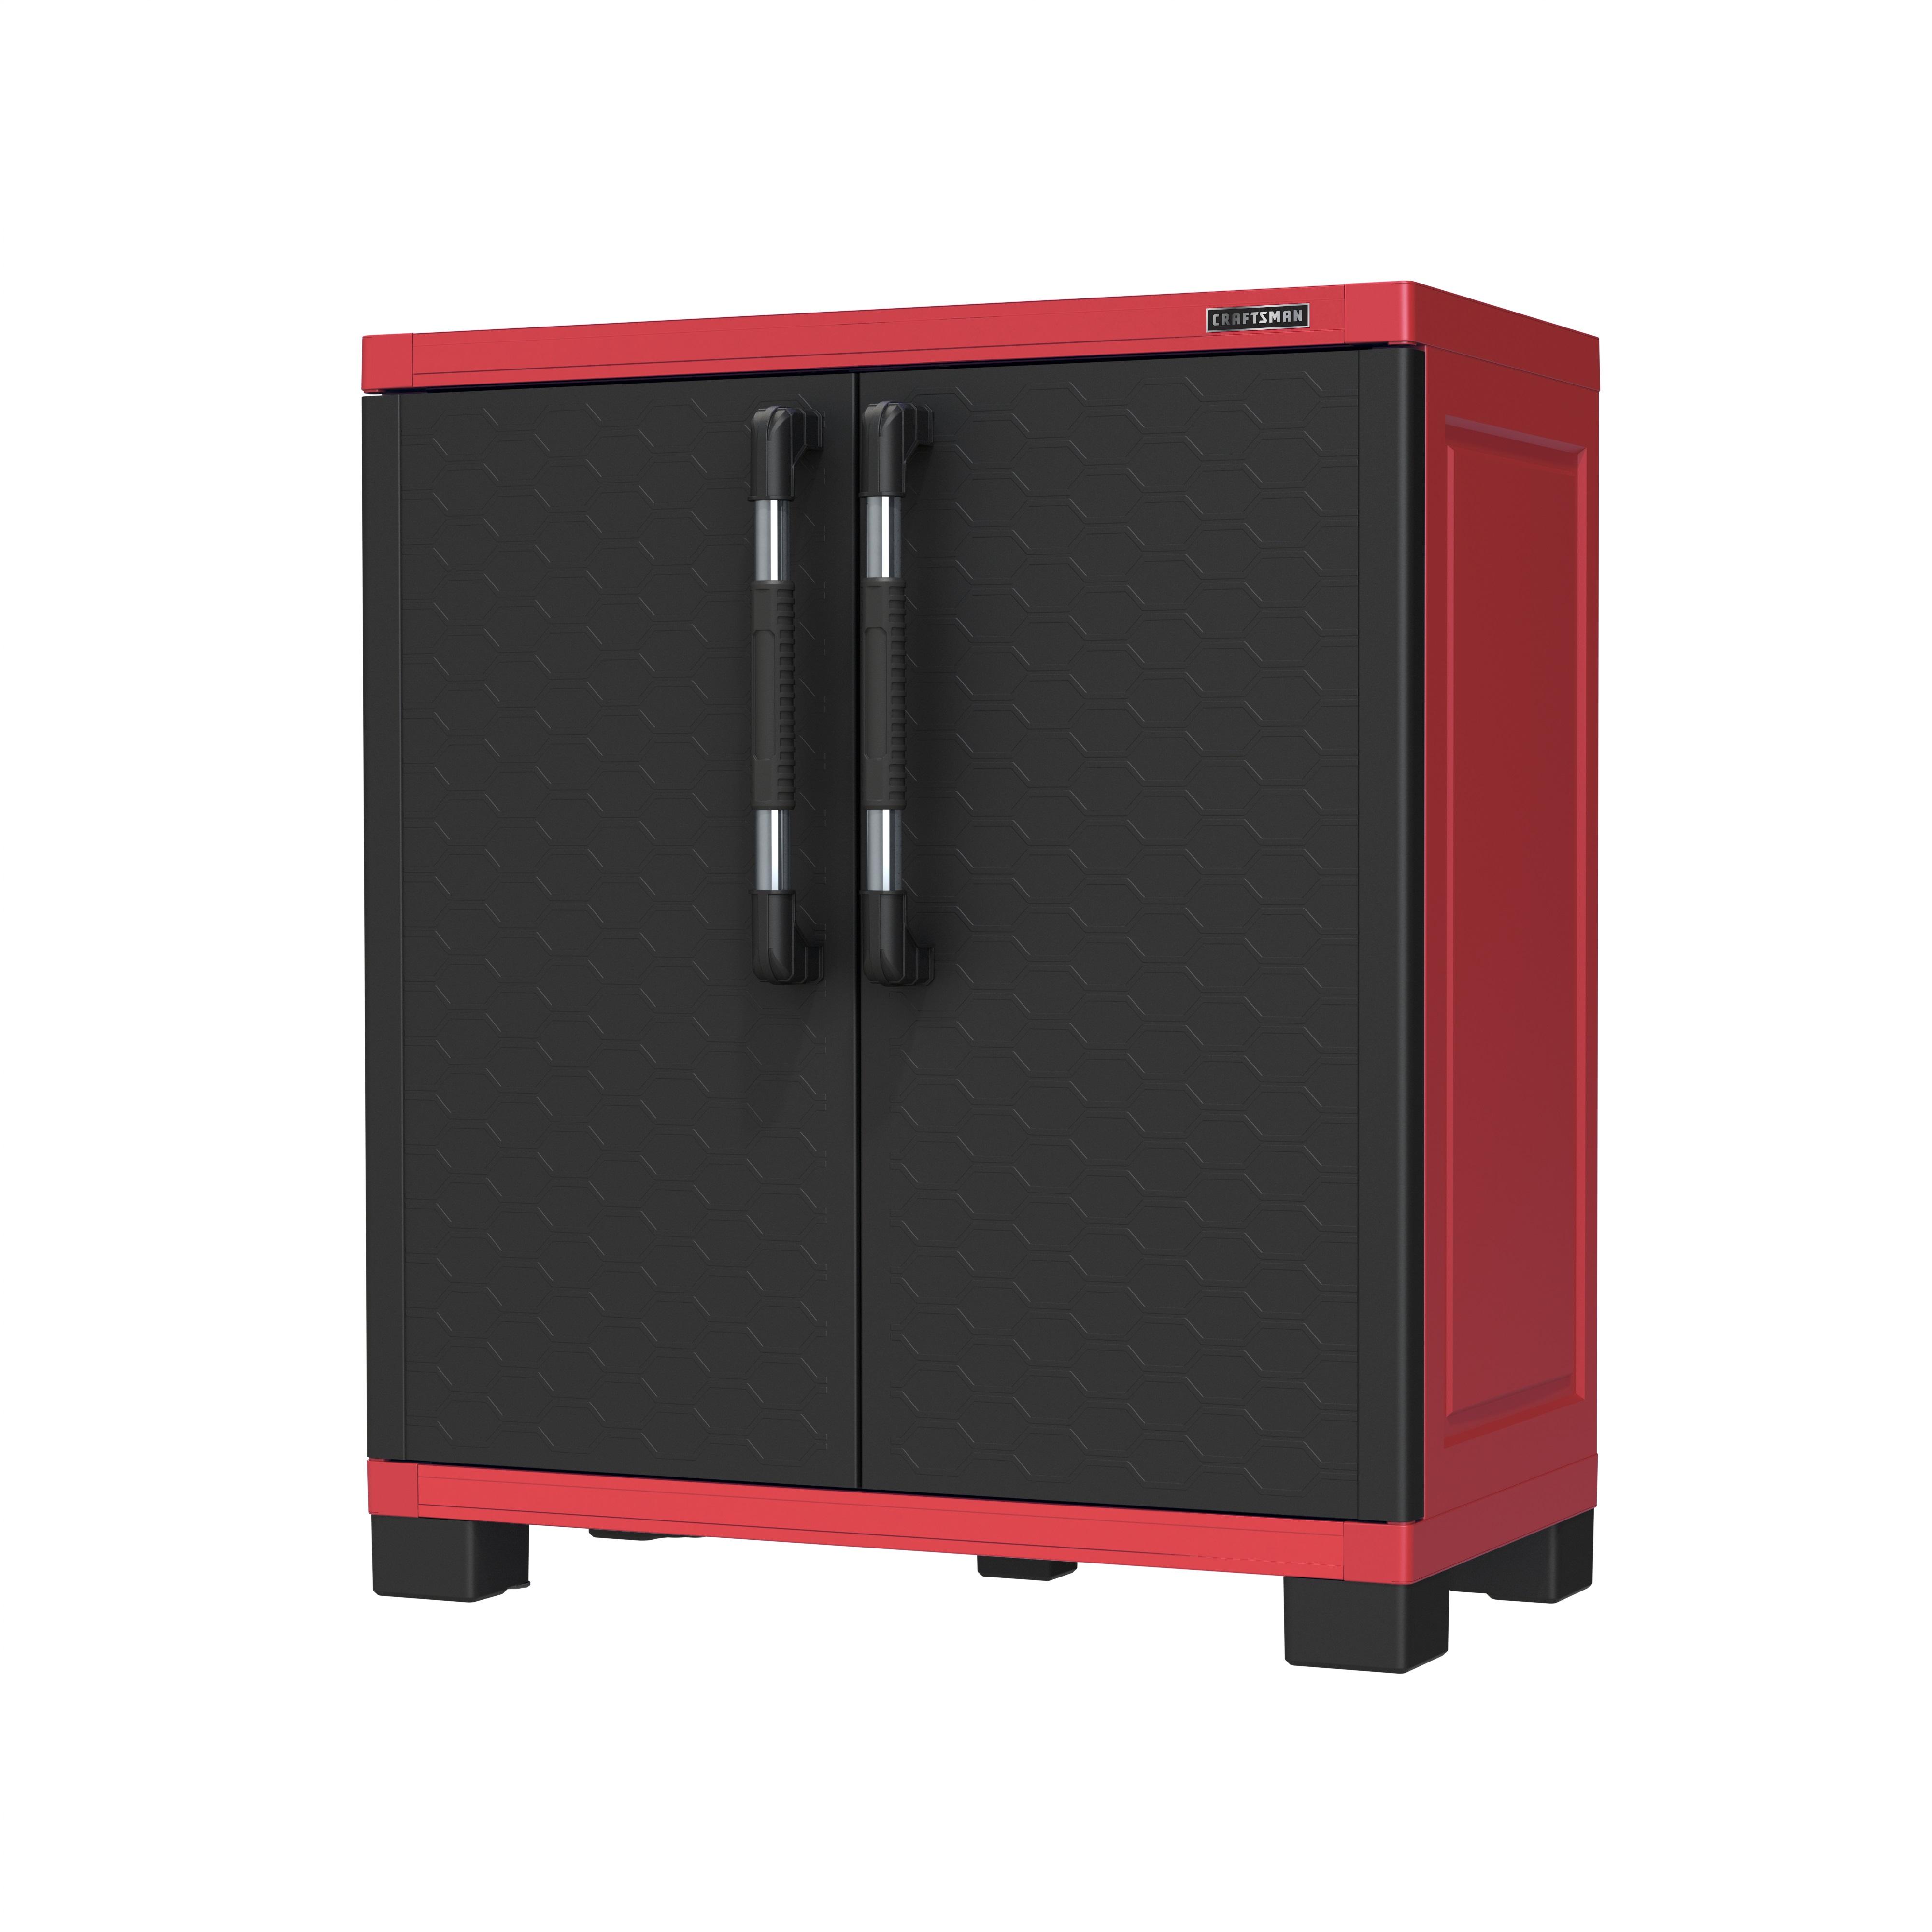 p P sears kitchen cabinets Craftsman Plastic 35 Storage Base Cabinet Tools Garage Organization Shelving Garage Storage Separates